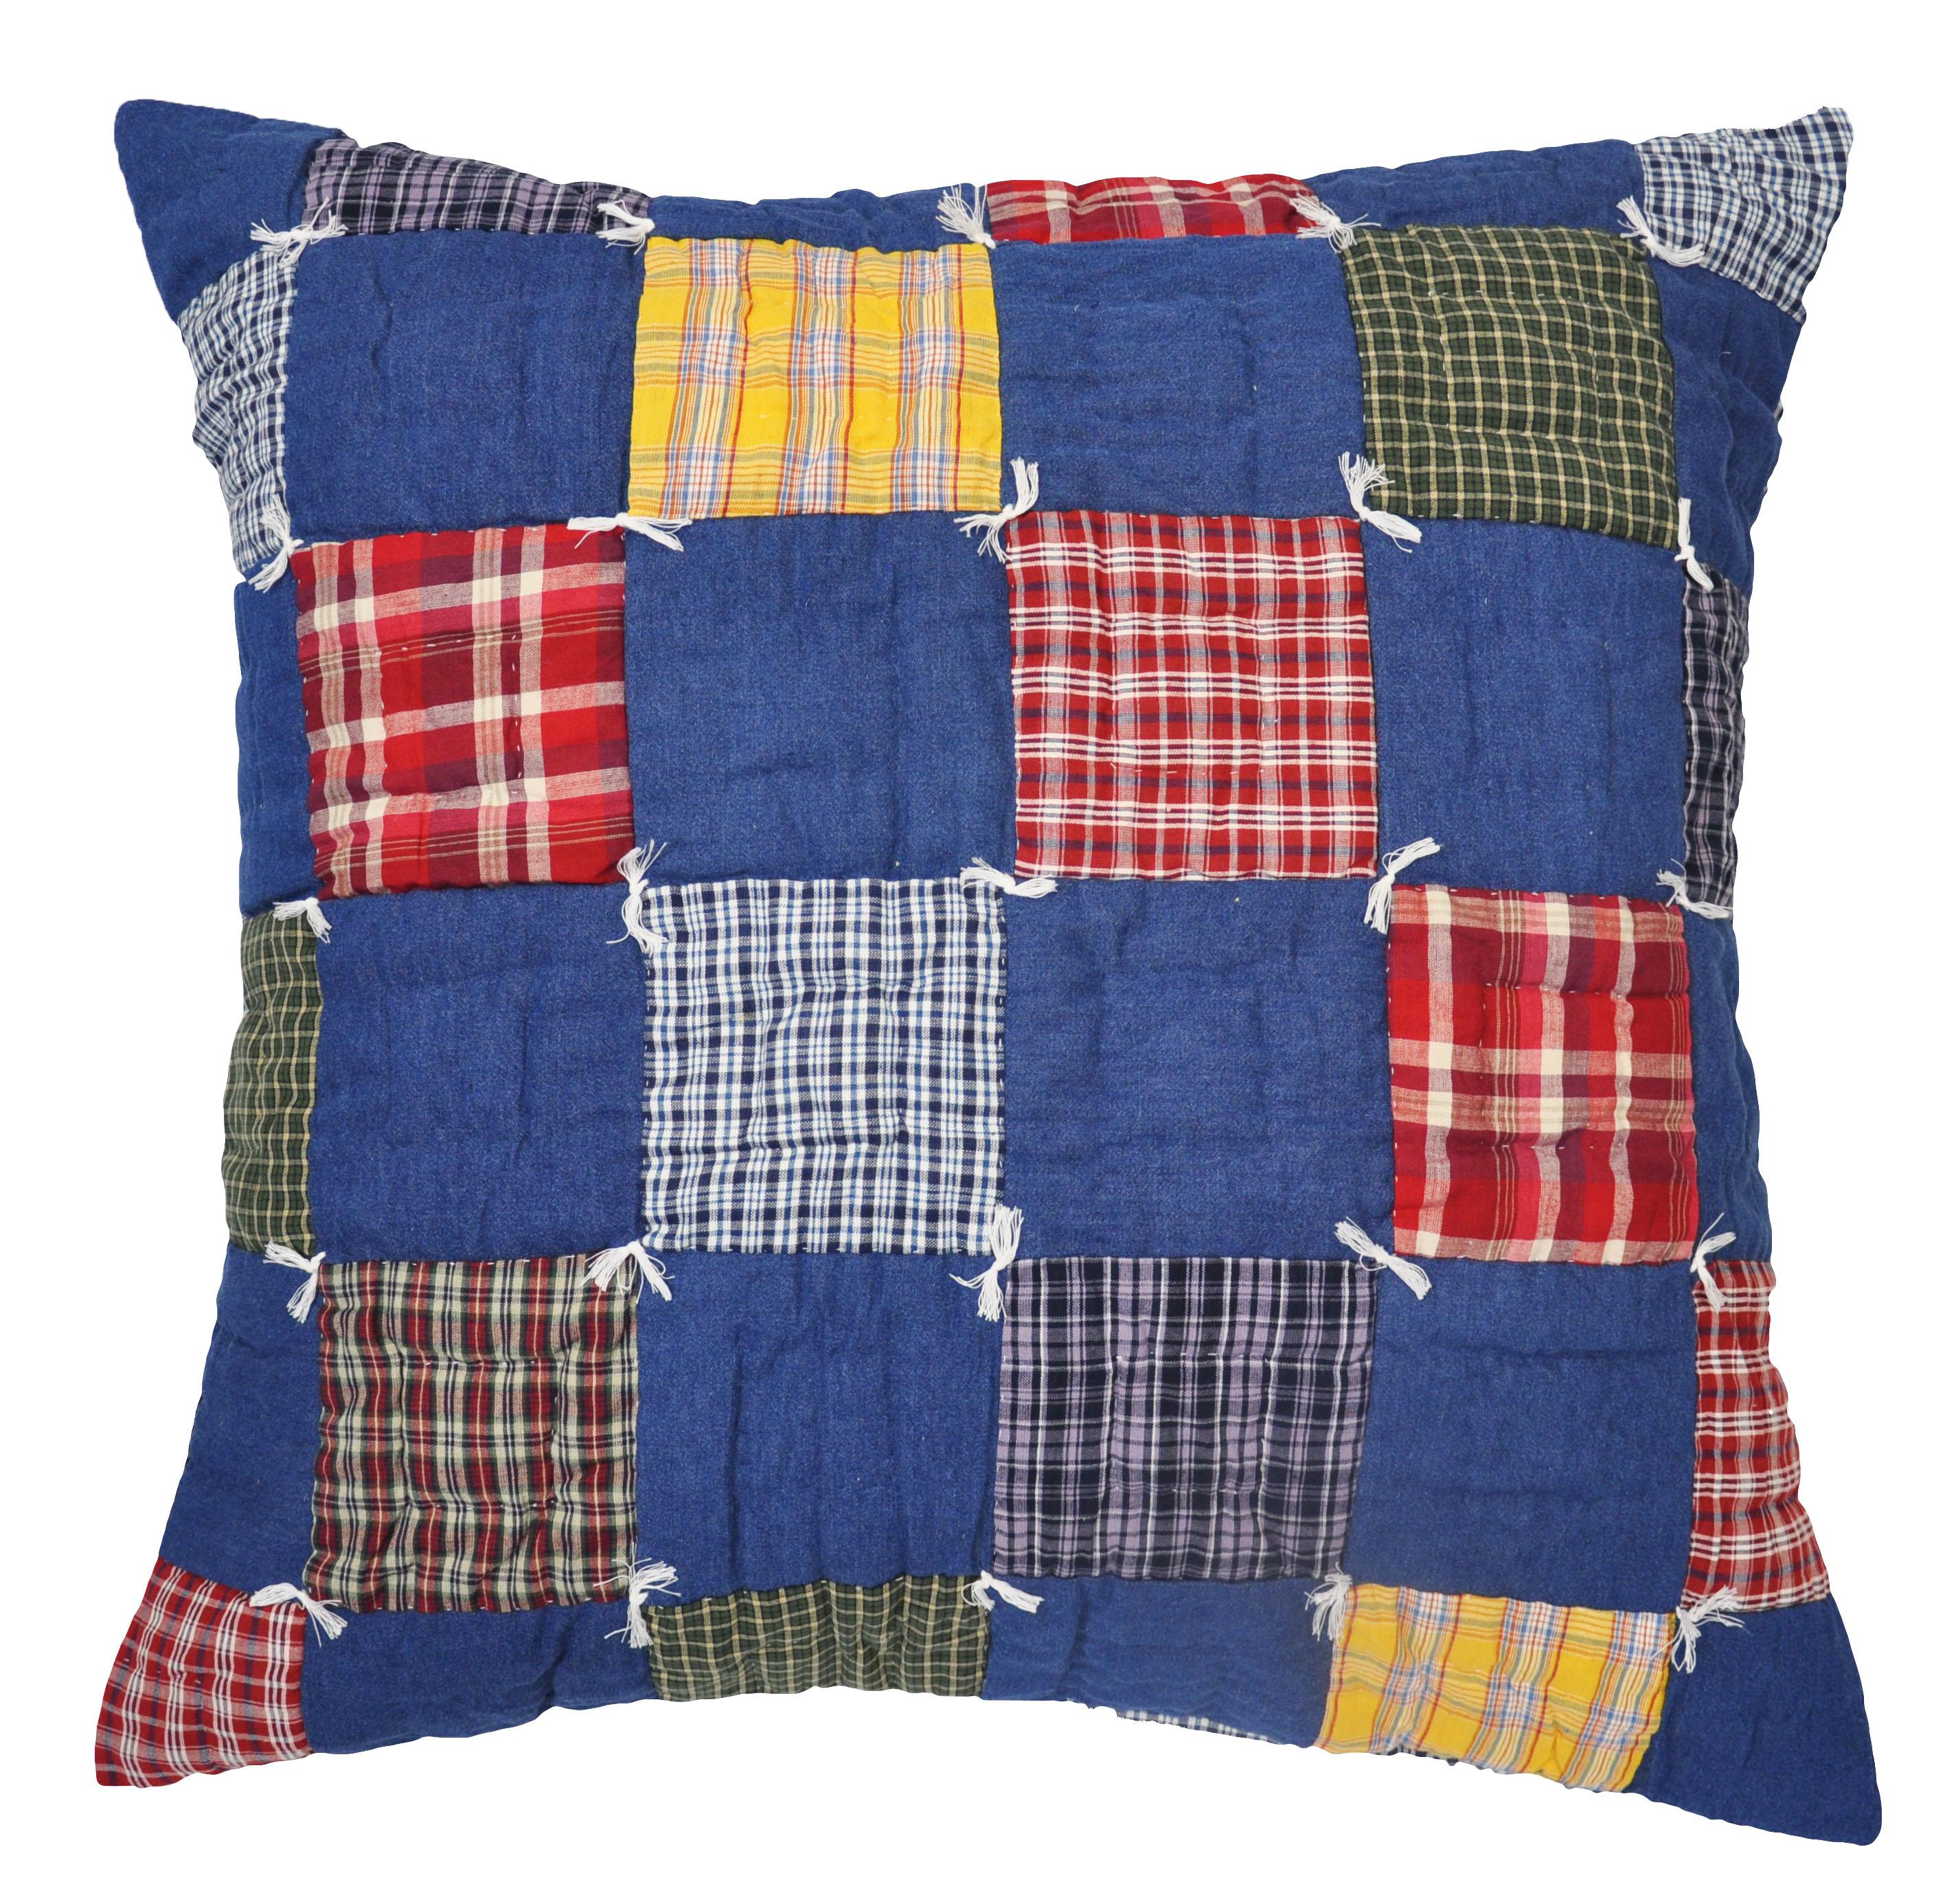 Caftan Traditional Patchwork Denim Euro Throw Pillow